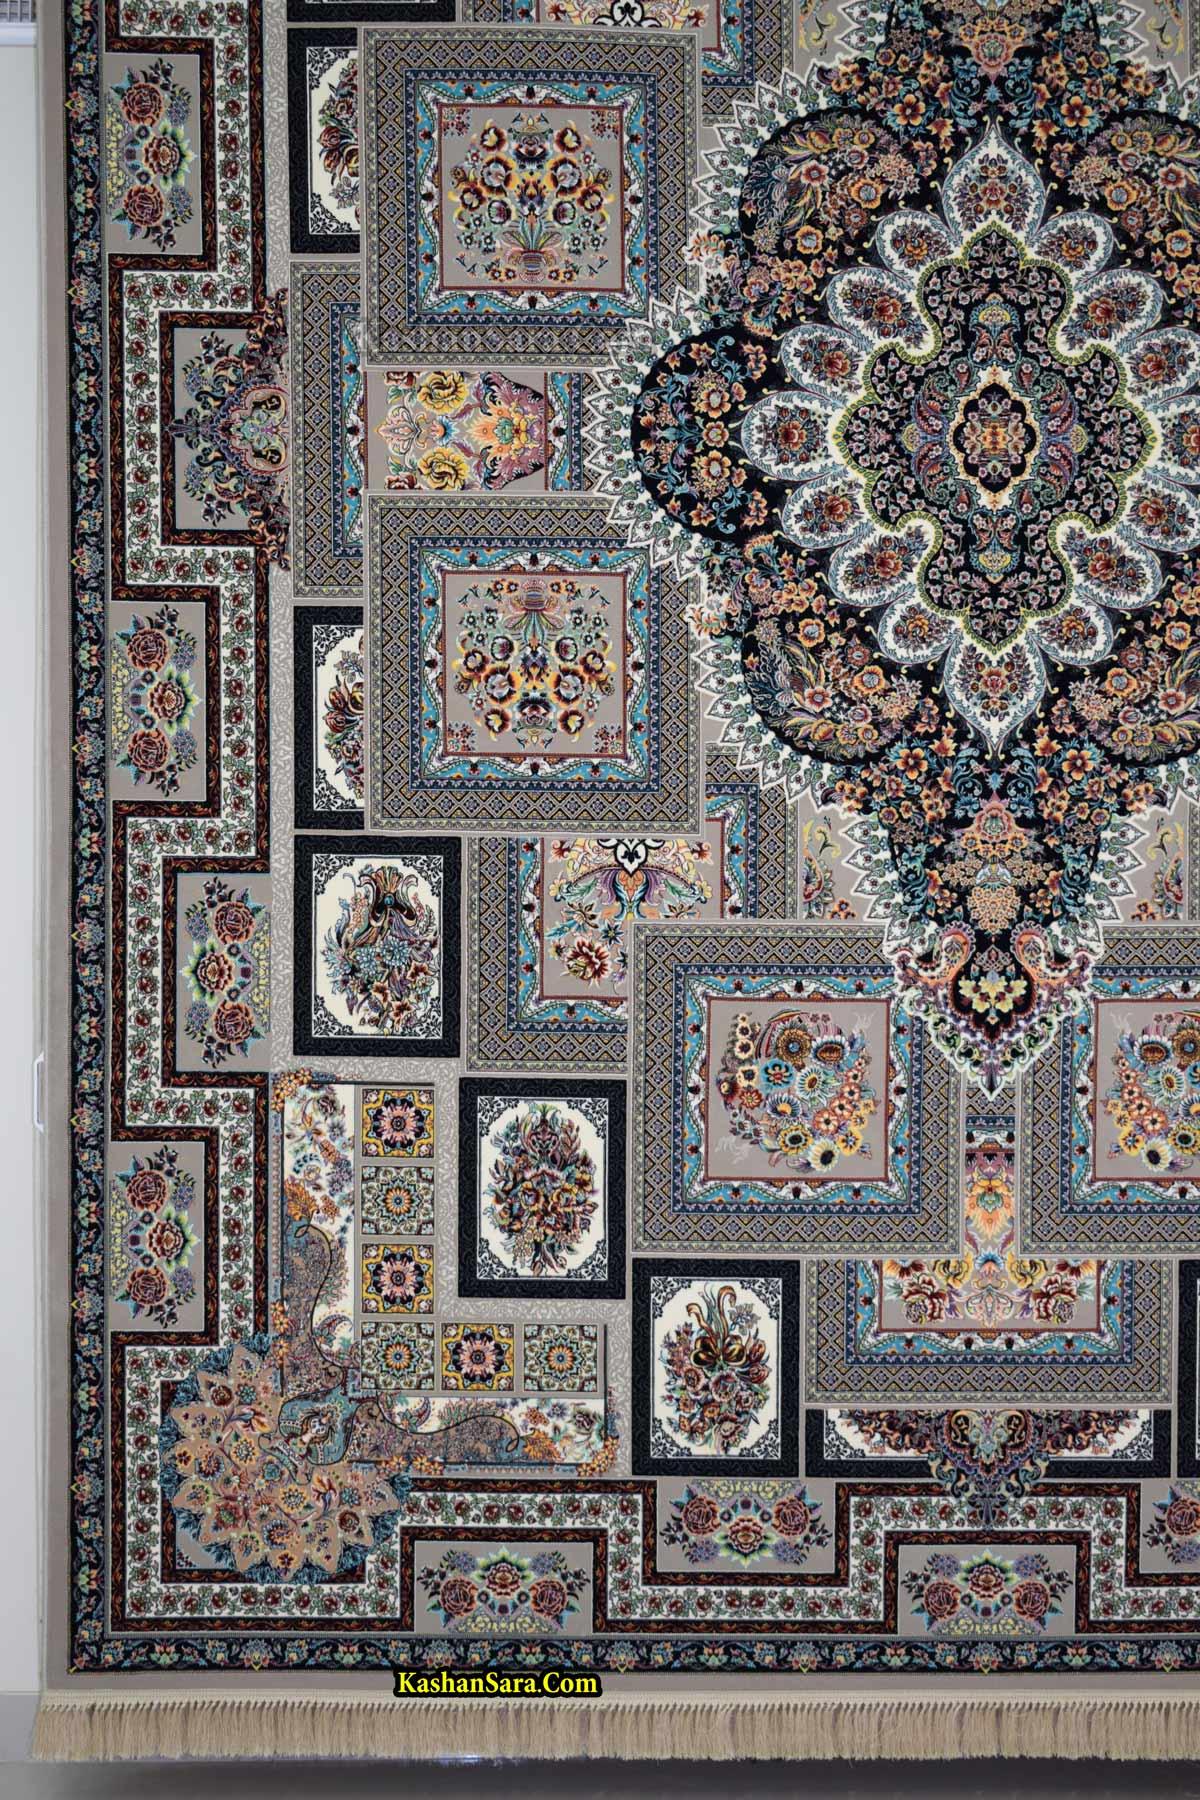 فرش یگانه ۱۲۰۰ شانه